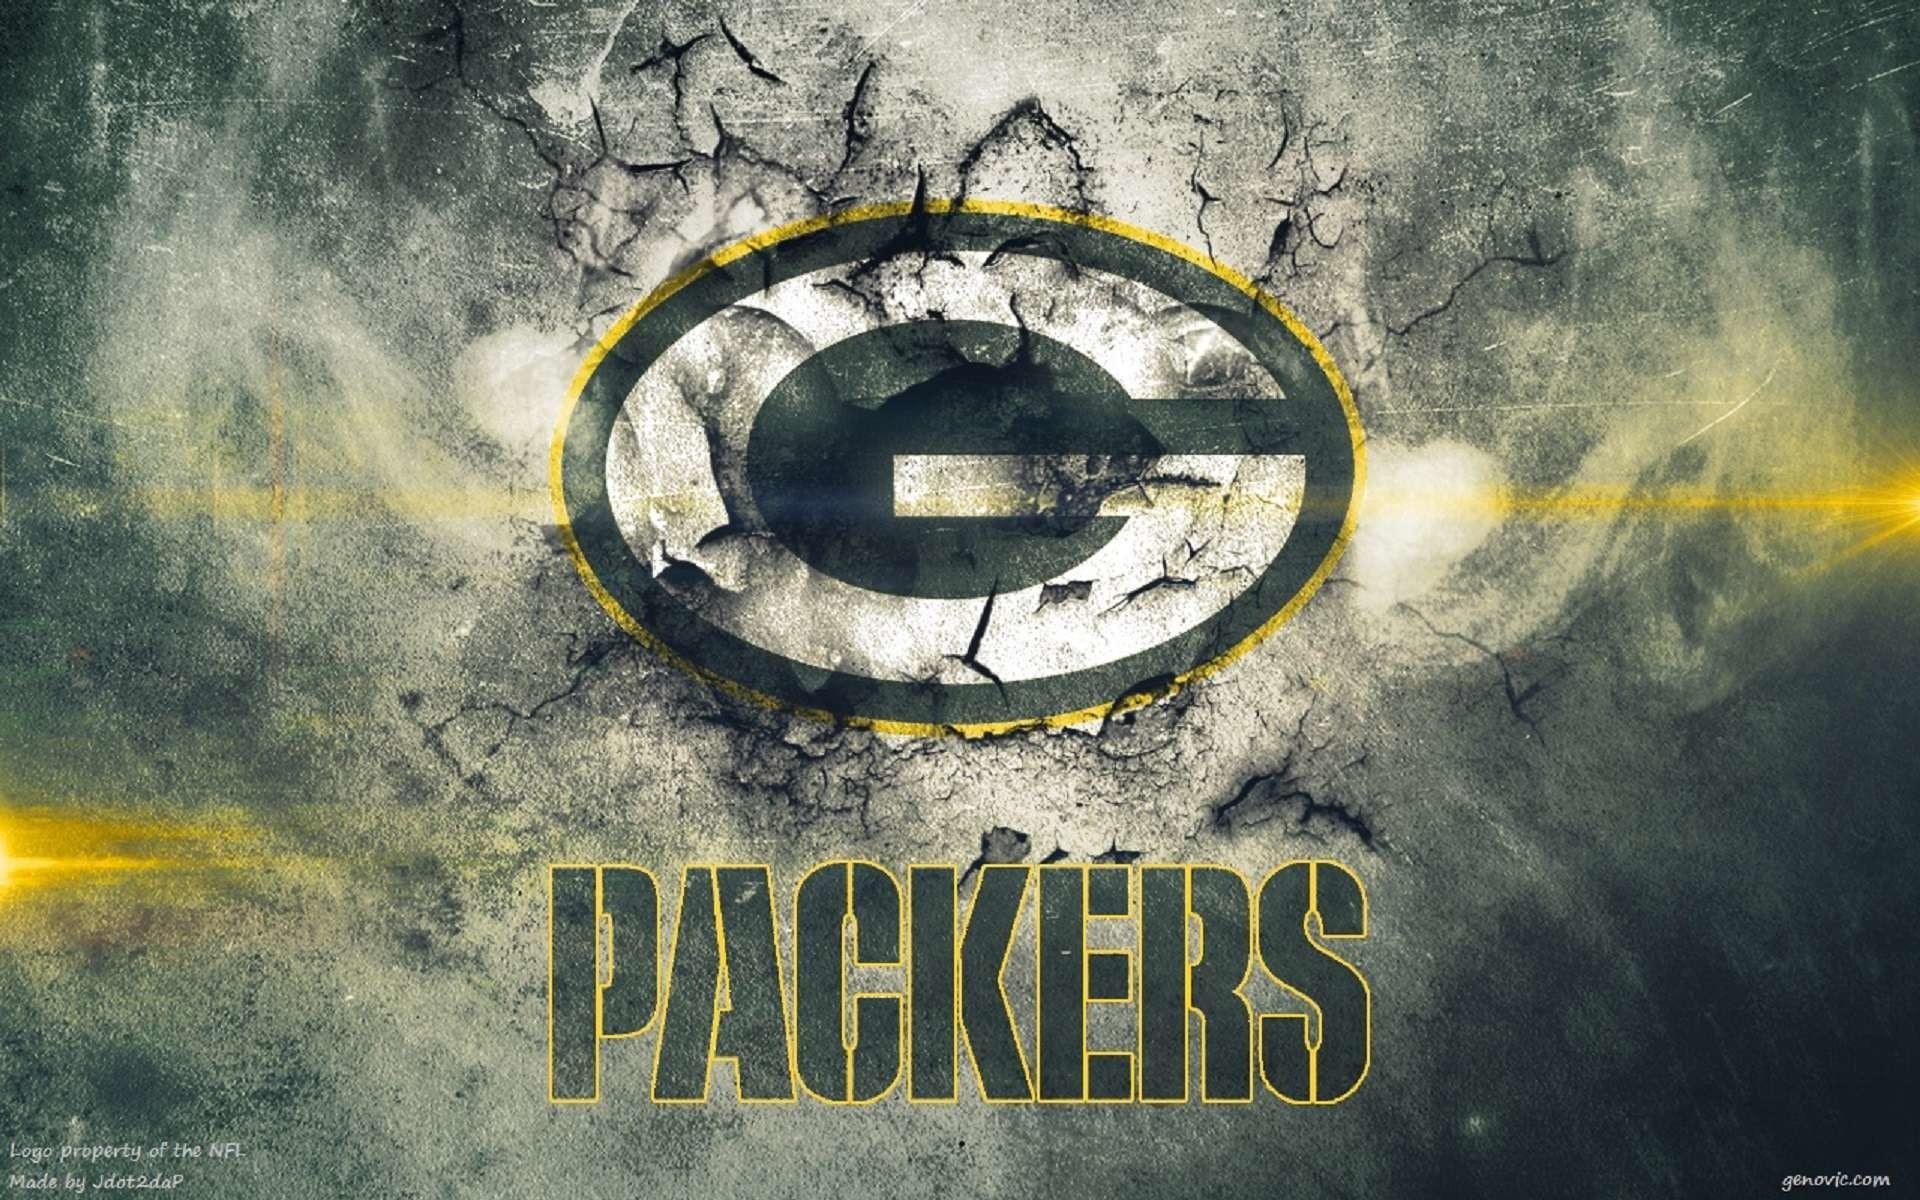 Green Bay Packers Wallpaper   HD Wallpapers